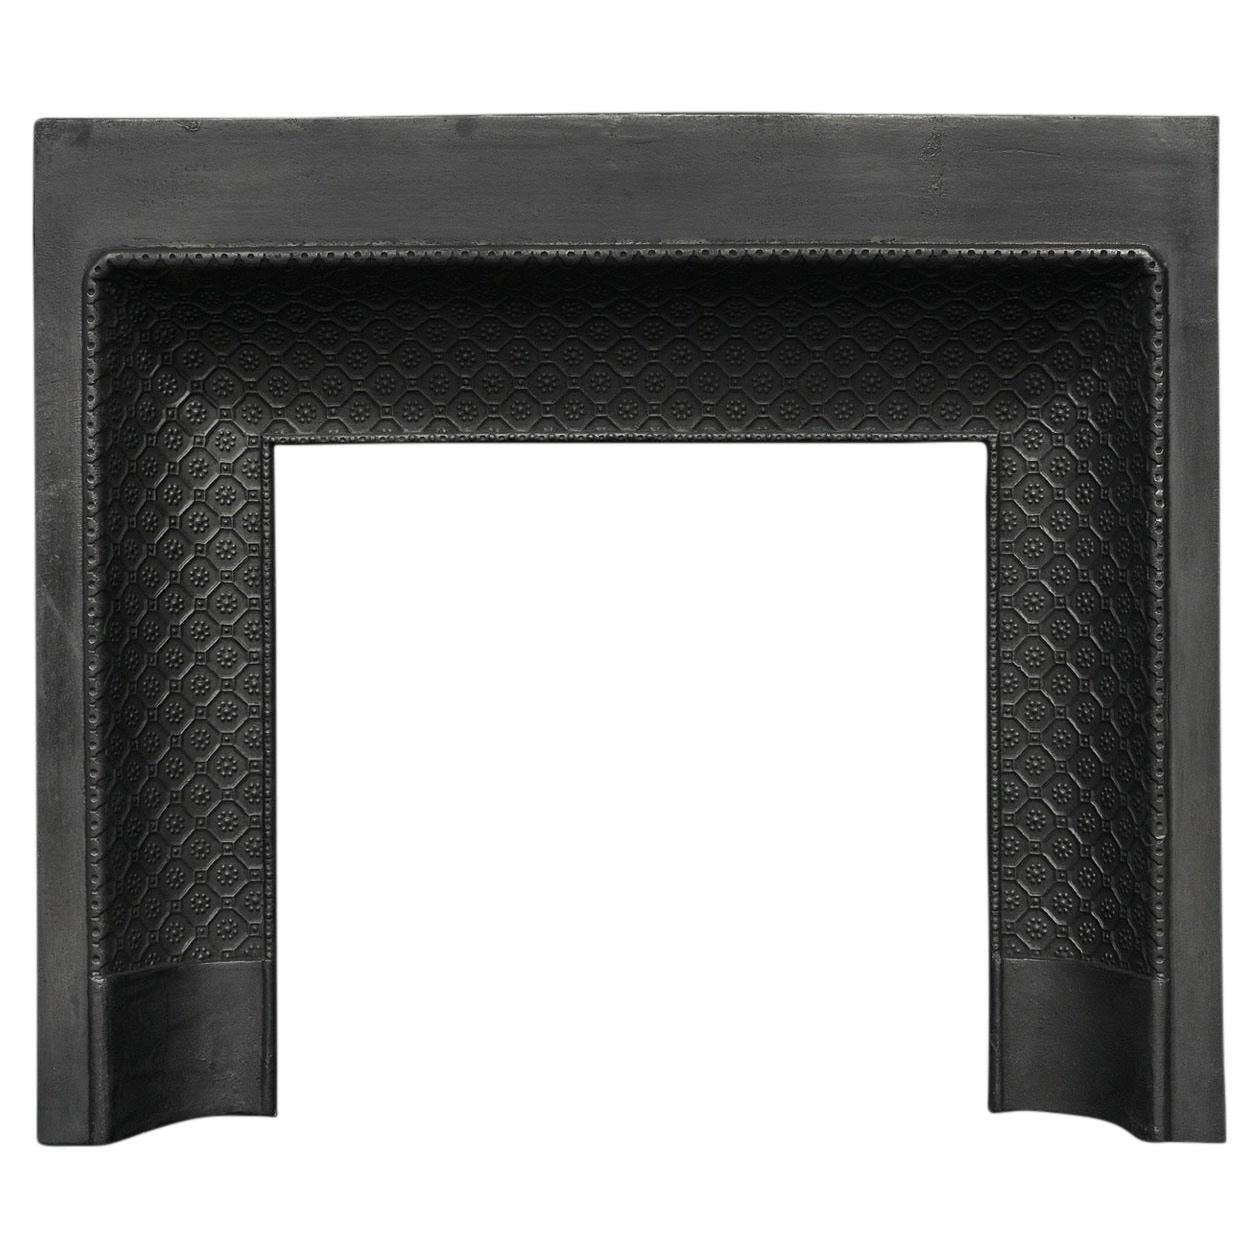 Decorative Cast Iron Fireplace Insert